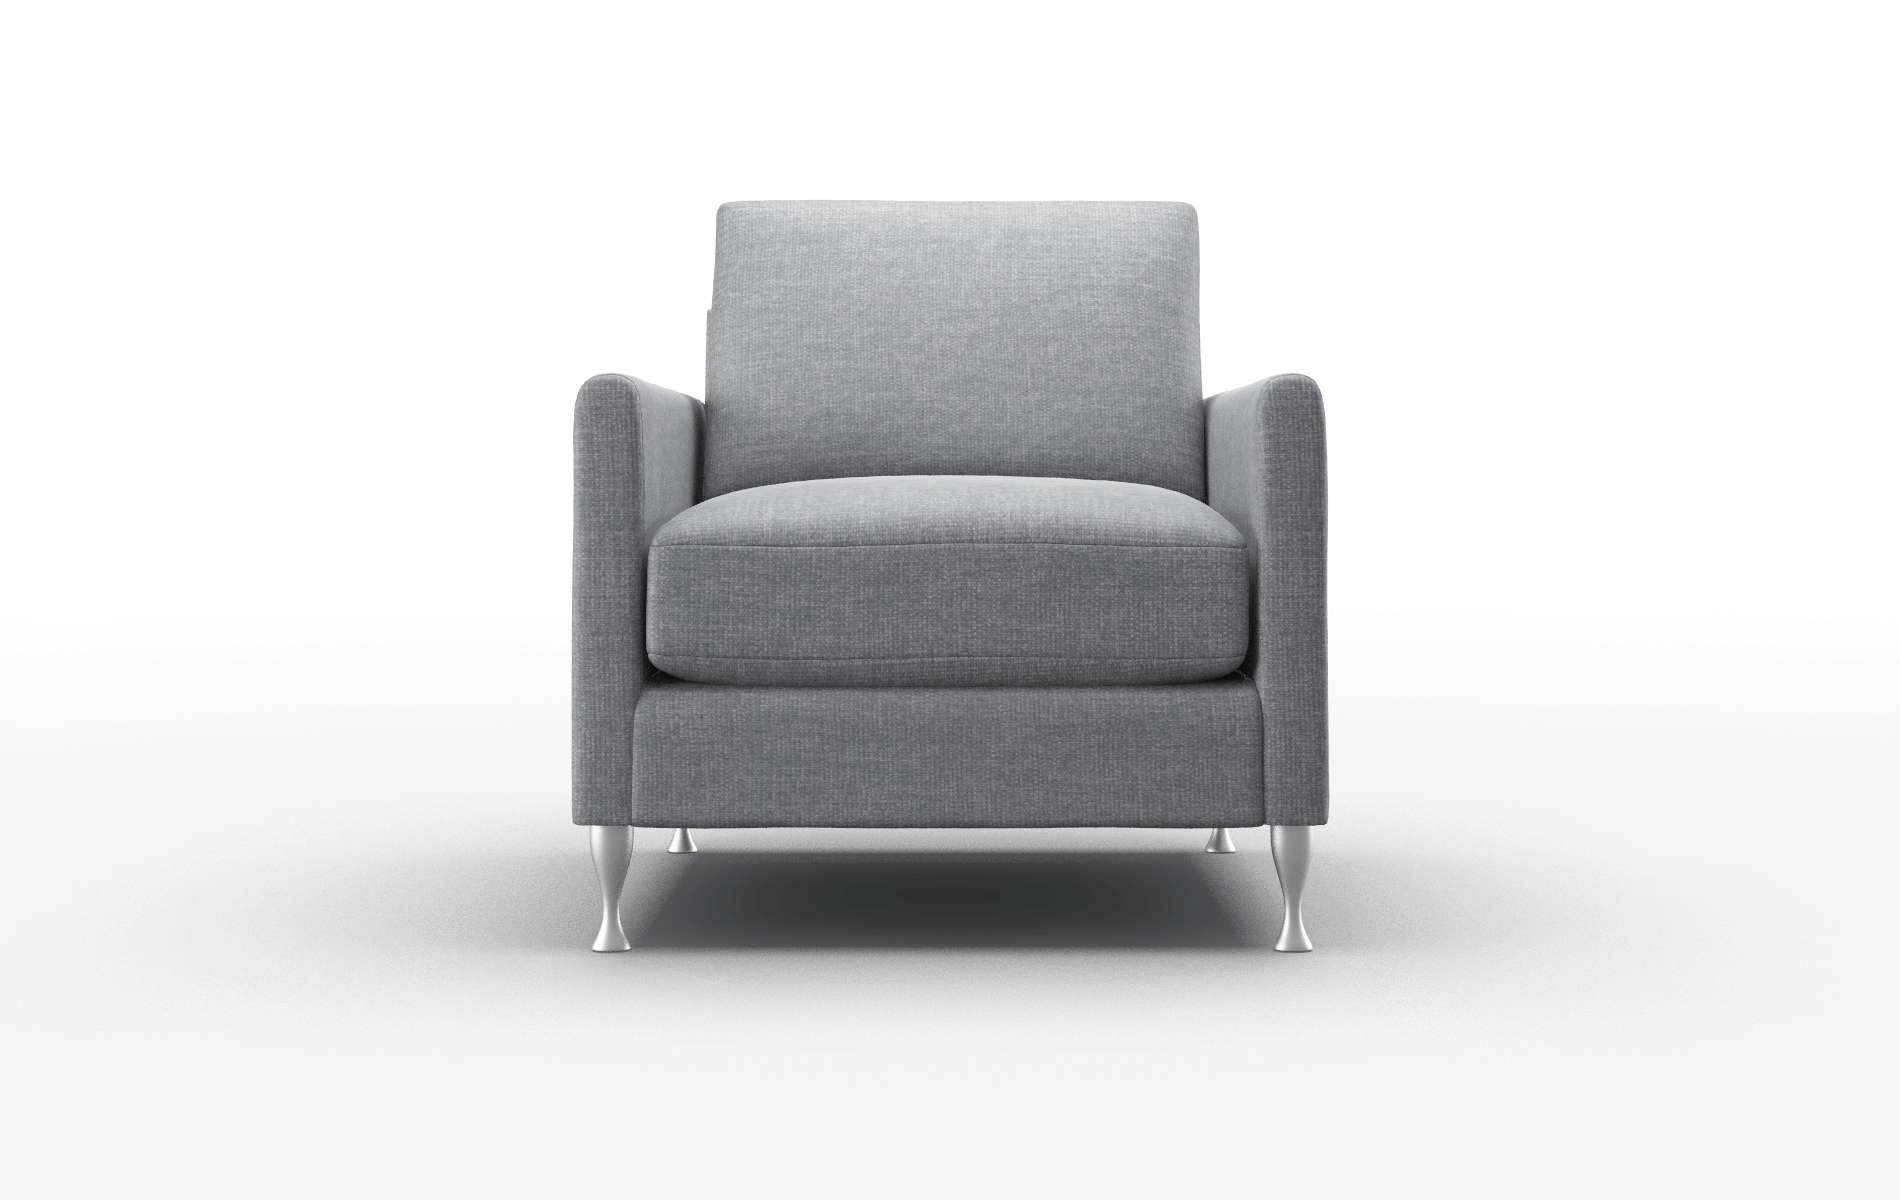 Eureka Keylargo Graphite Chair metal legs 1